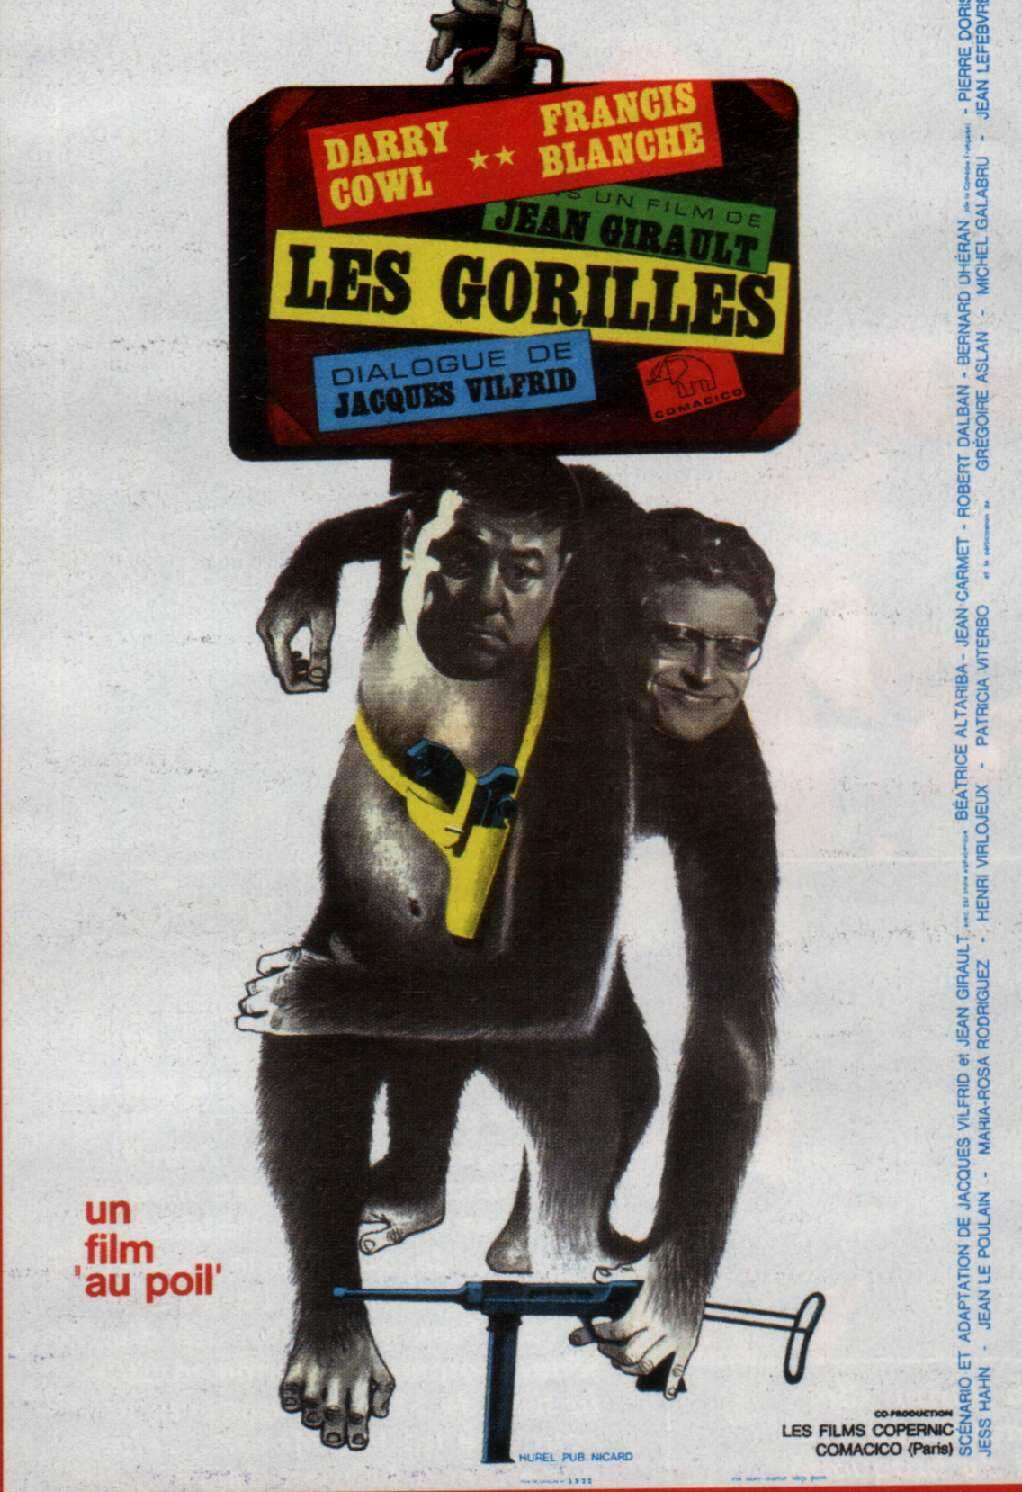 les gorilles de jean girault